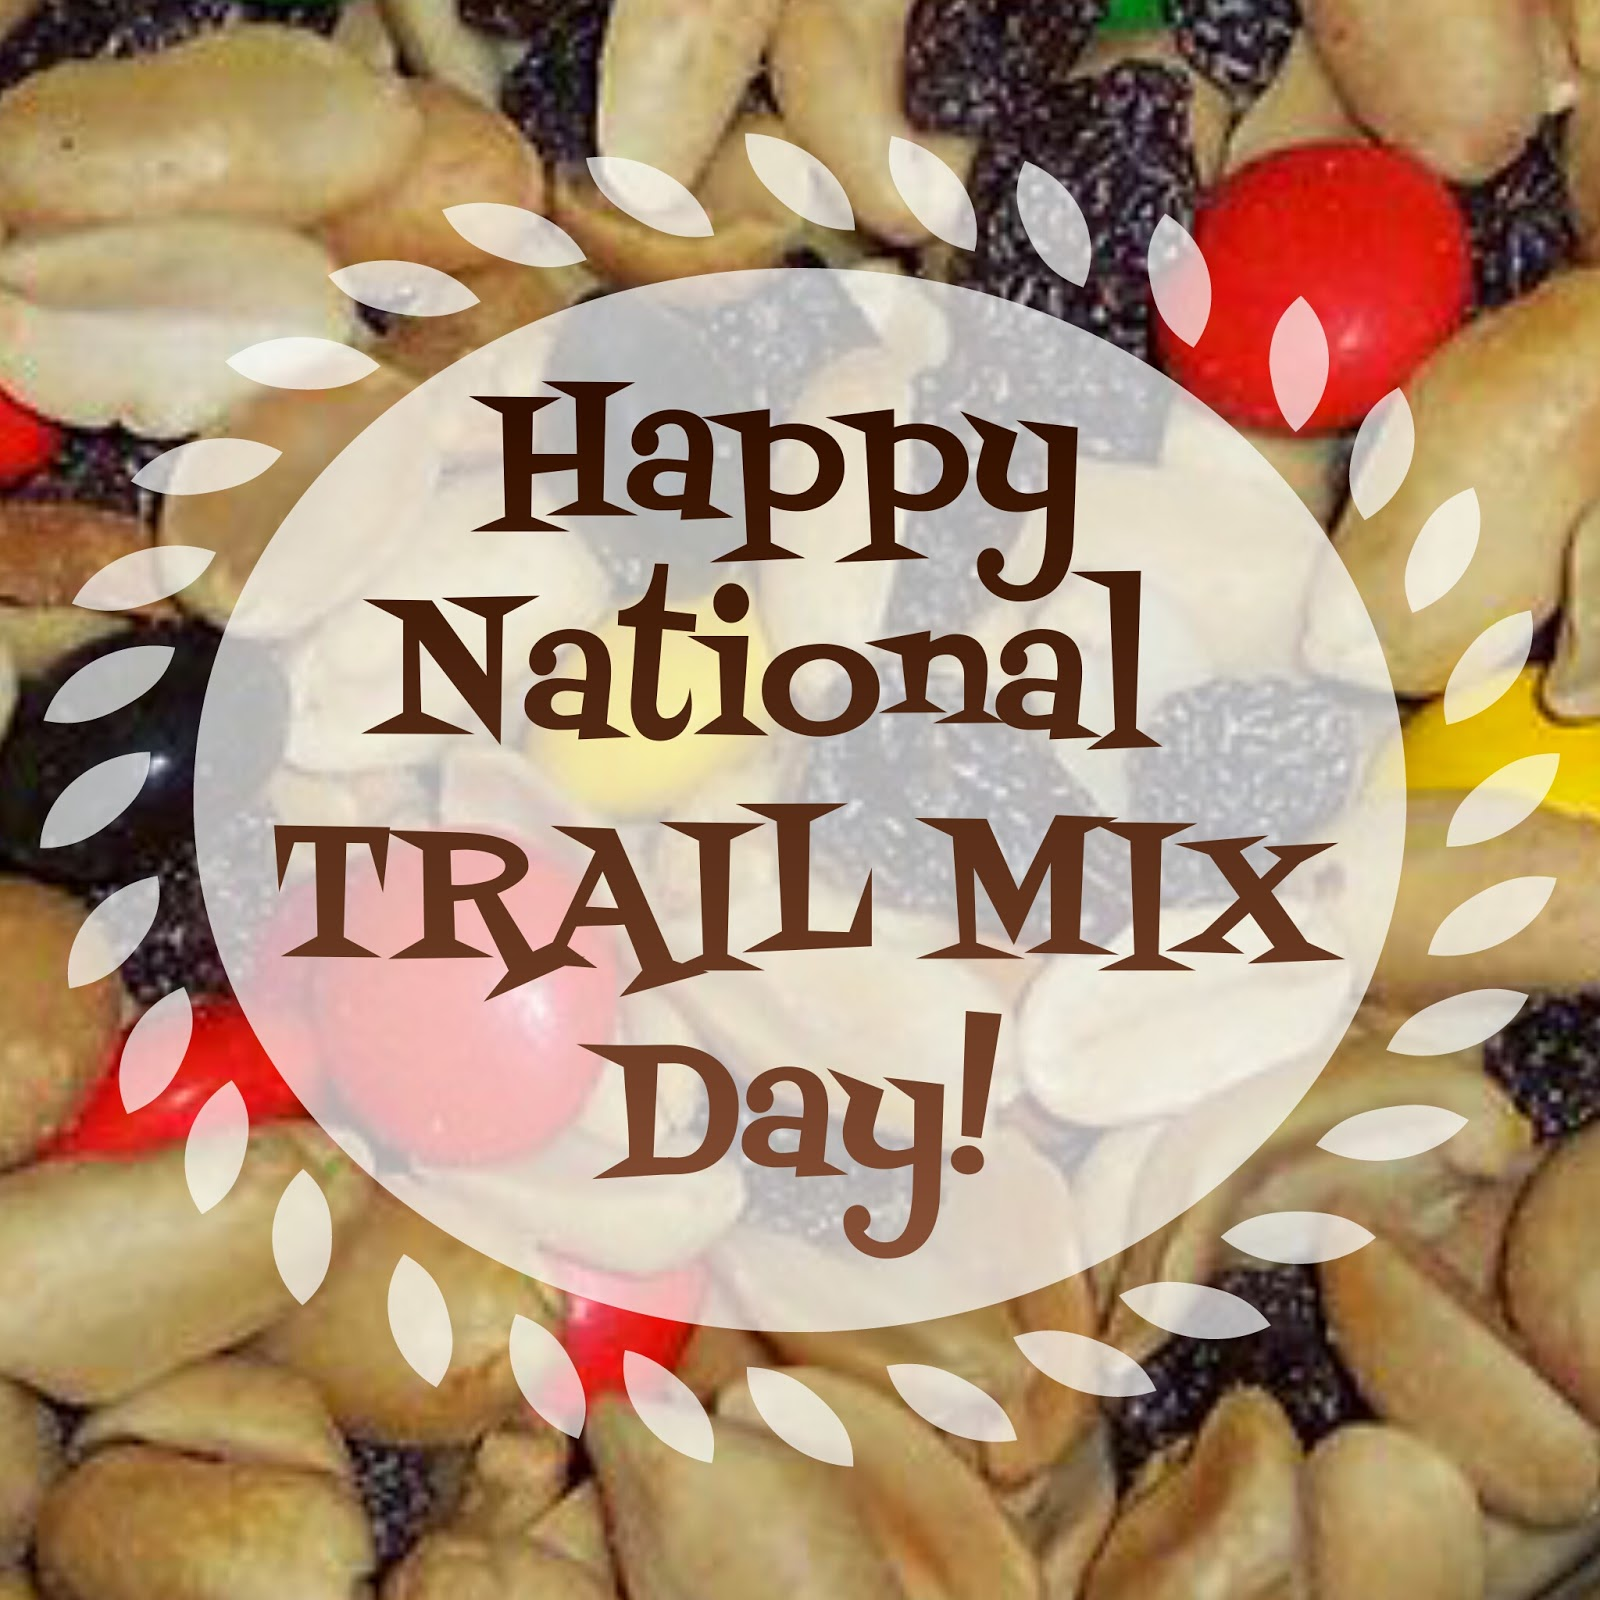 Free Trail Mix Cliparts, Download Free Clip Art, Free Clip ...  |Bowl Clipart Trail Mix